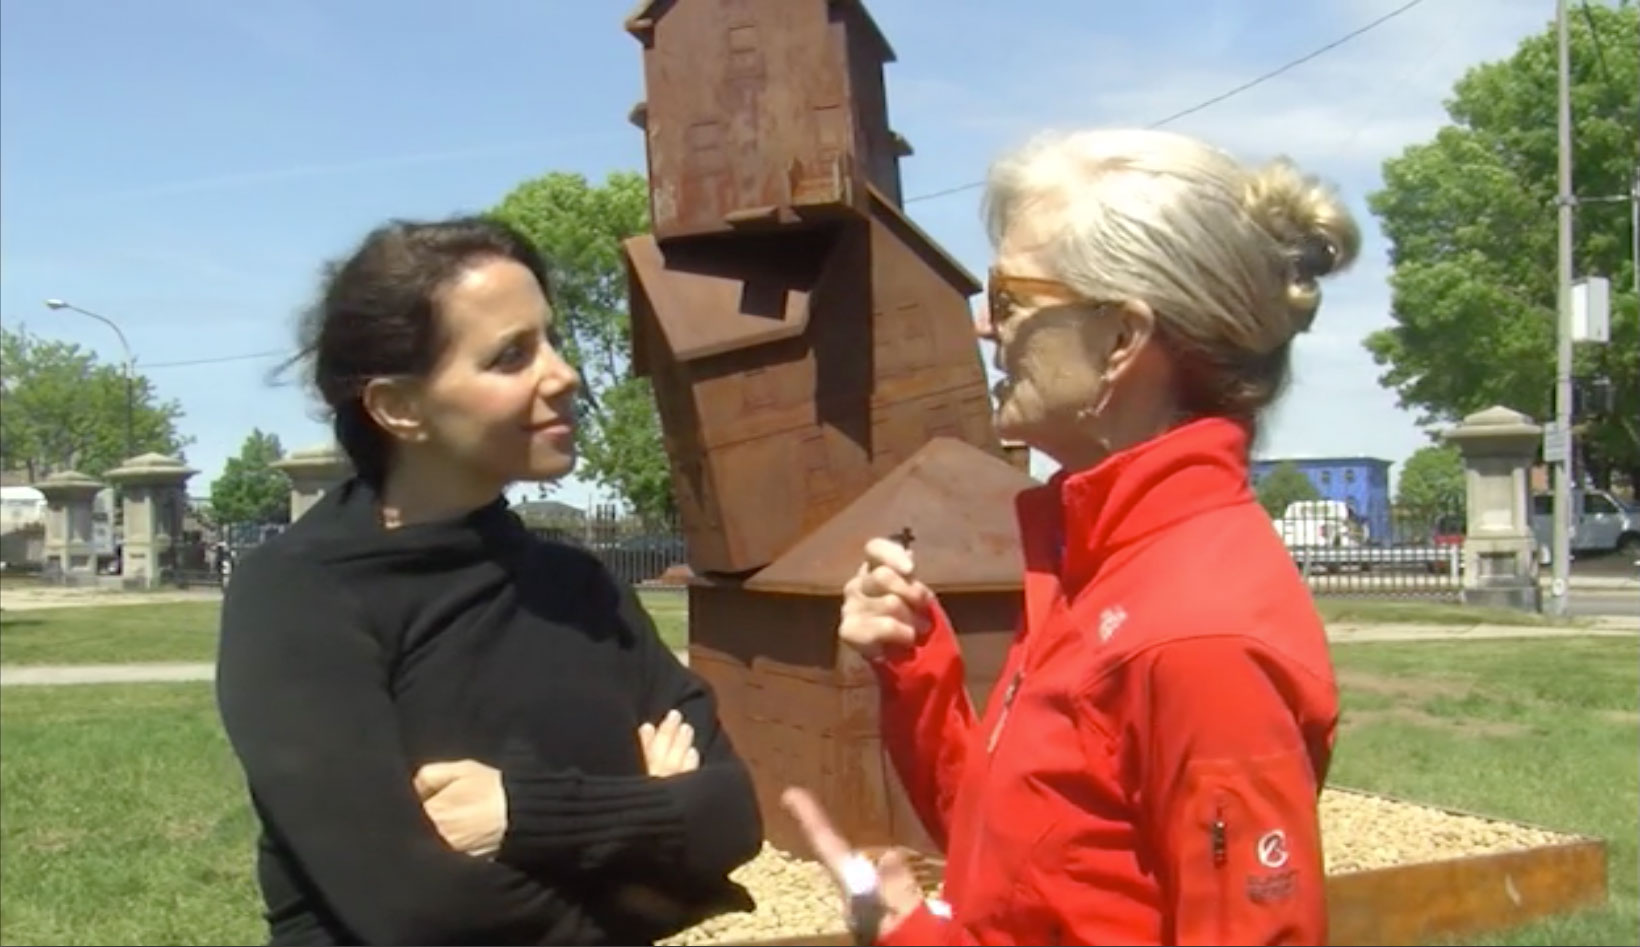 CTN's Lesley MacVane chats with Judith Hoffman, Artist